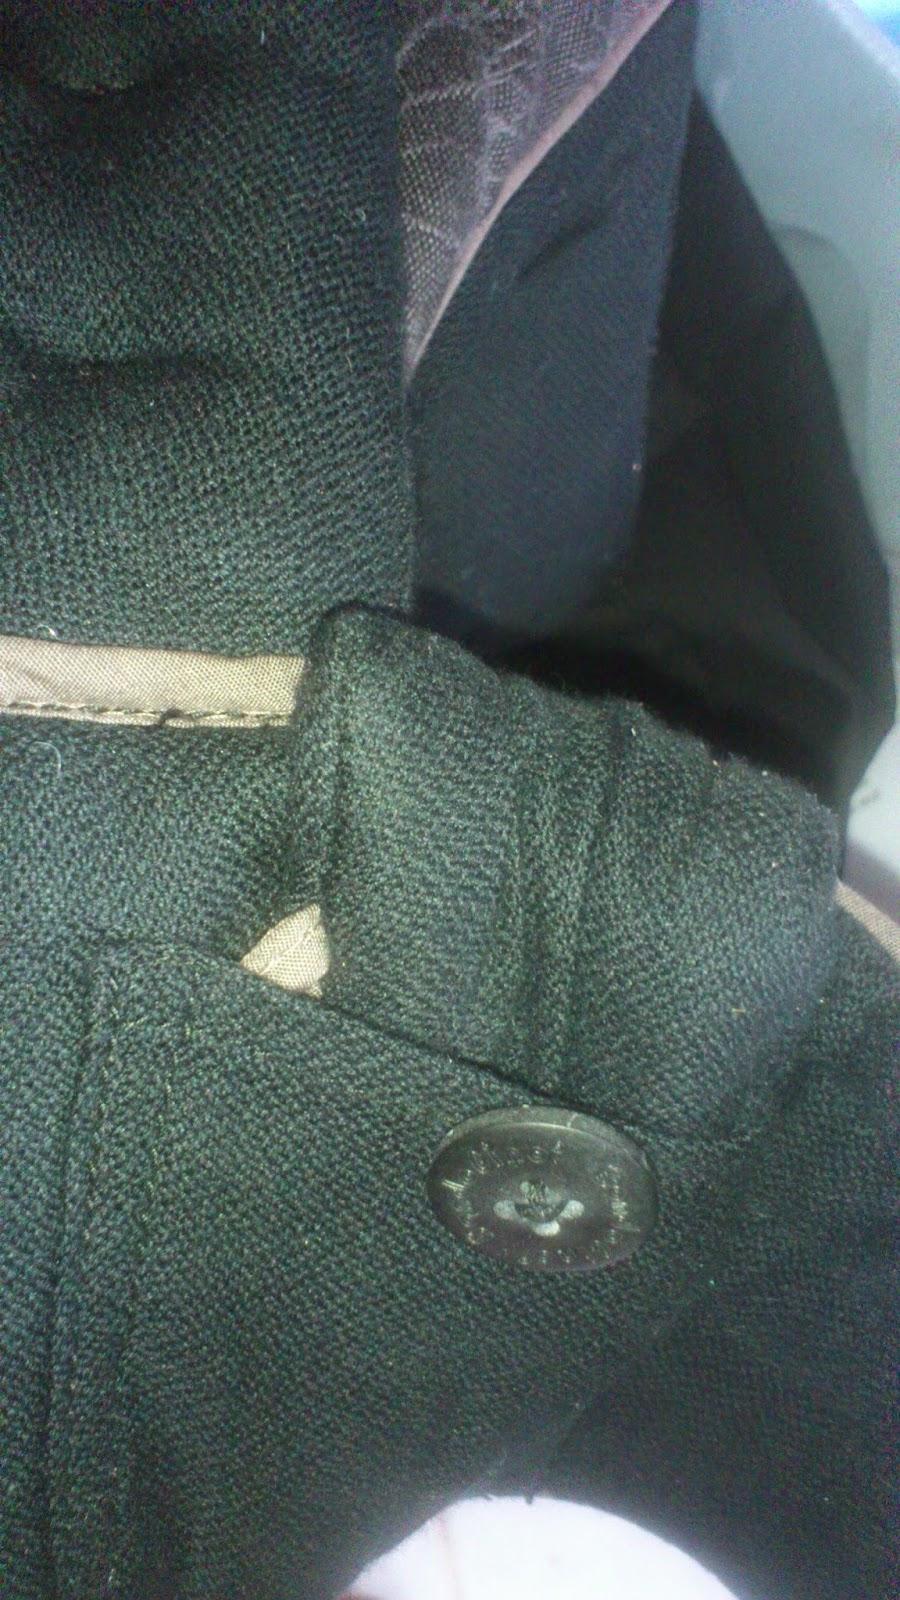 babywearing halfbuckle portage bondolino hoppediz préformé porte-bébé porter ailettes